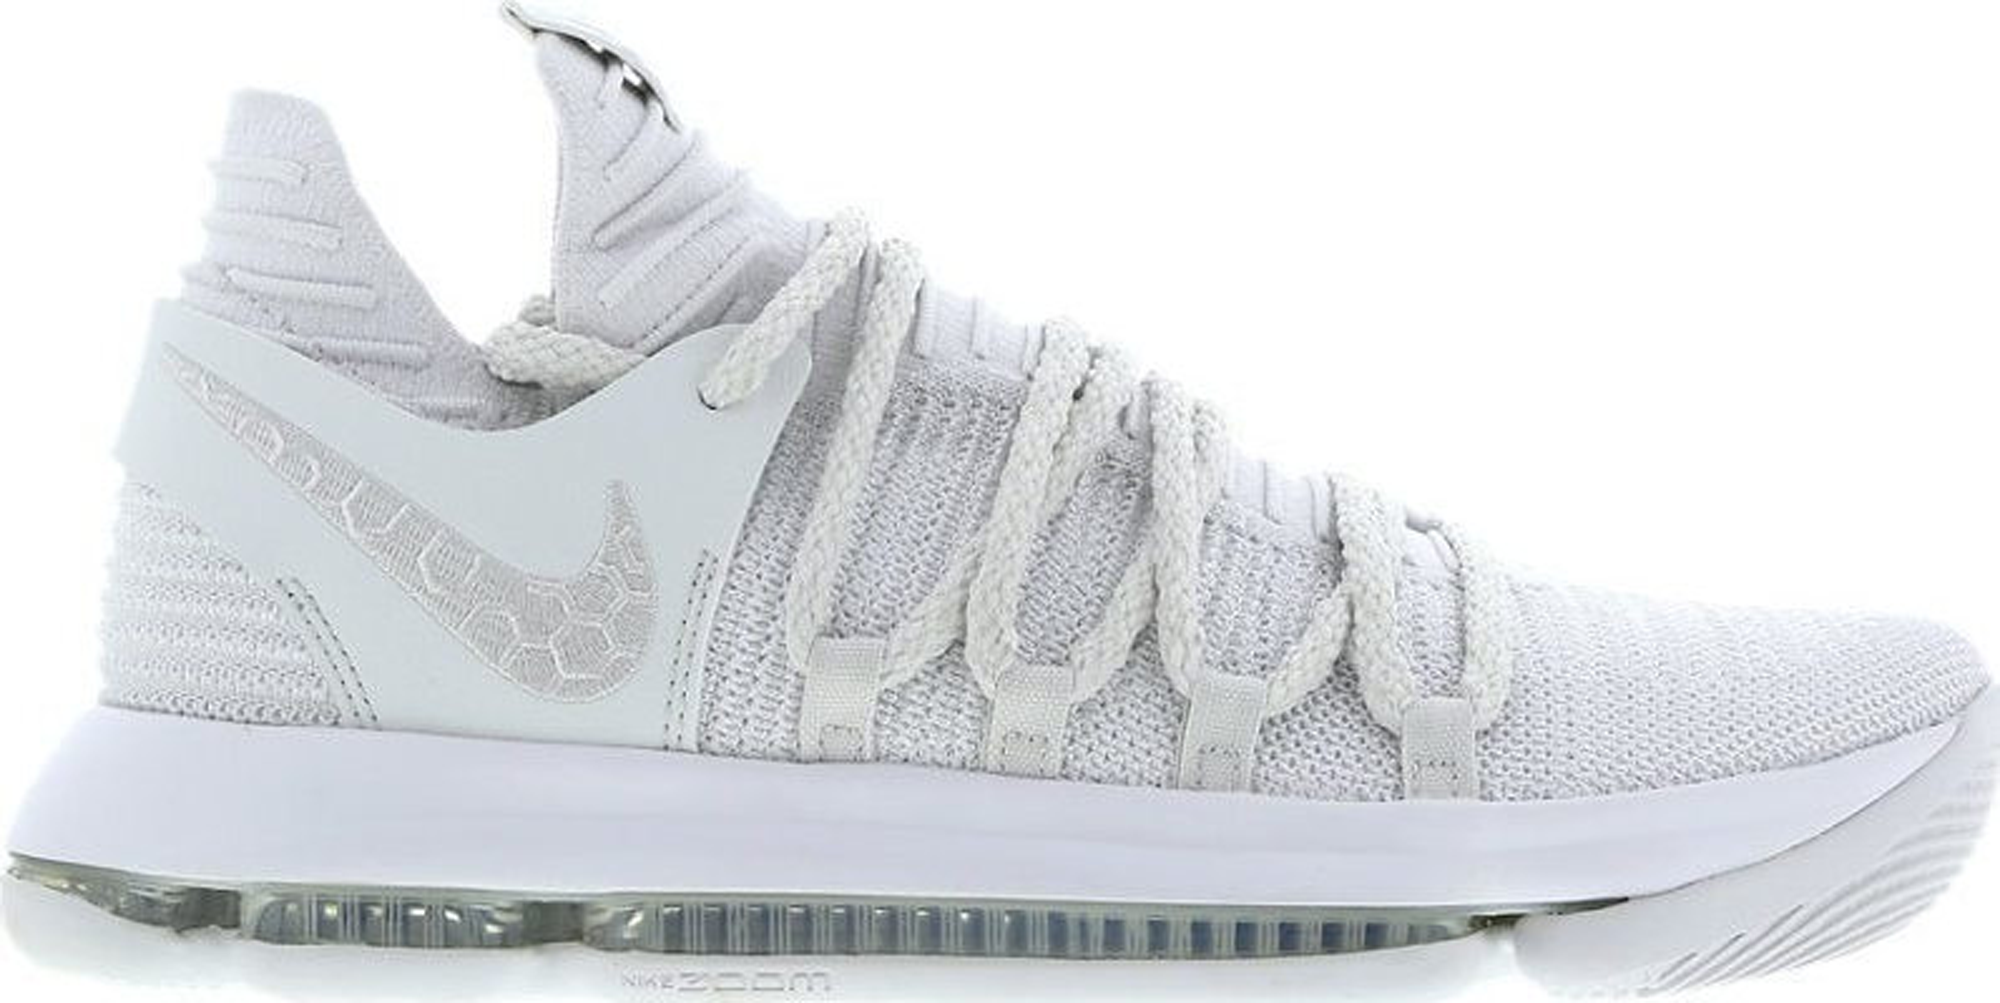 4f4ffd1c3 ... promo code kd 10 platinum 8eb99 95d0f australia for sale mens nike kd  10 platinum tint vast grey white basketball shoes ...